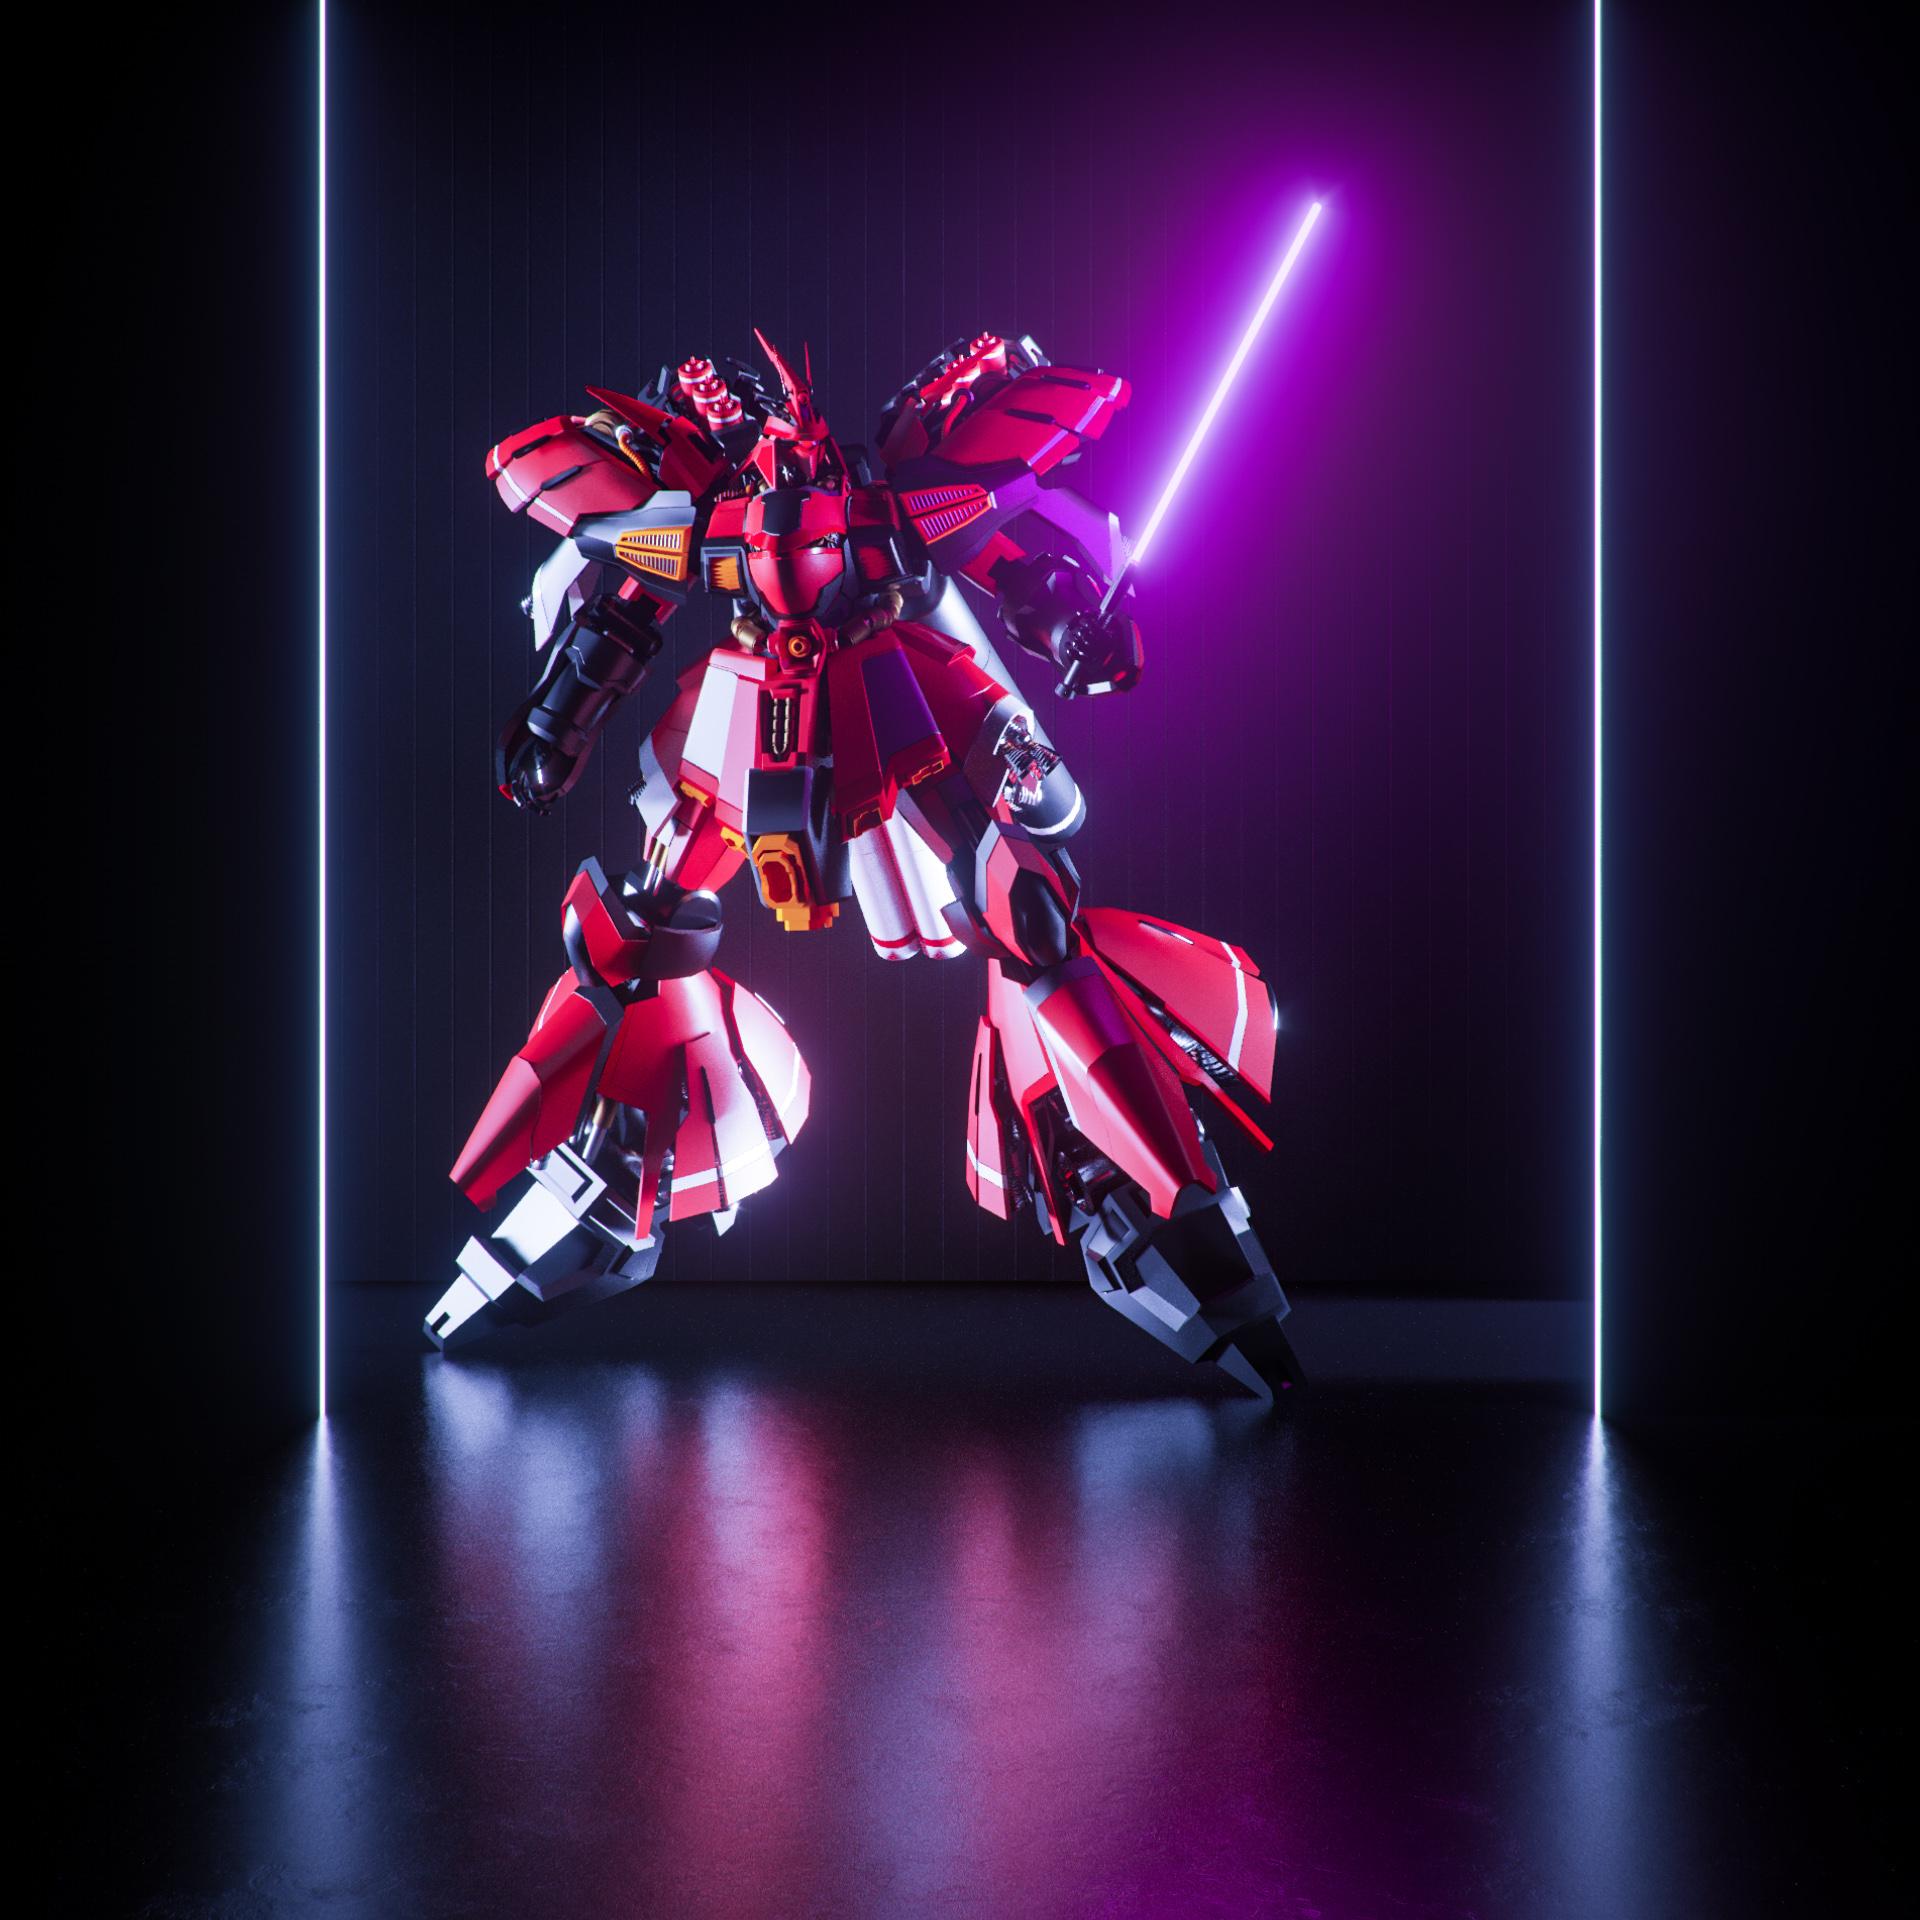 Gundam model by Kanatee via Sketchfab.